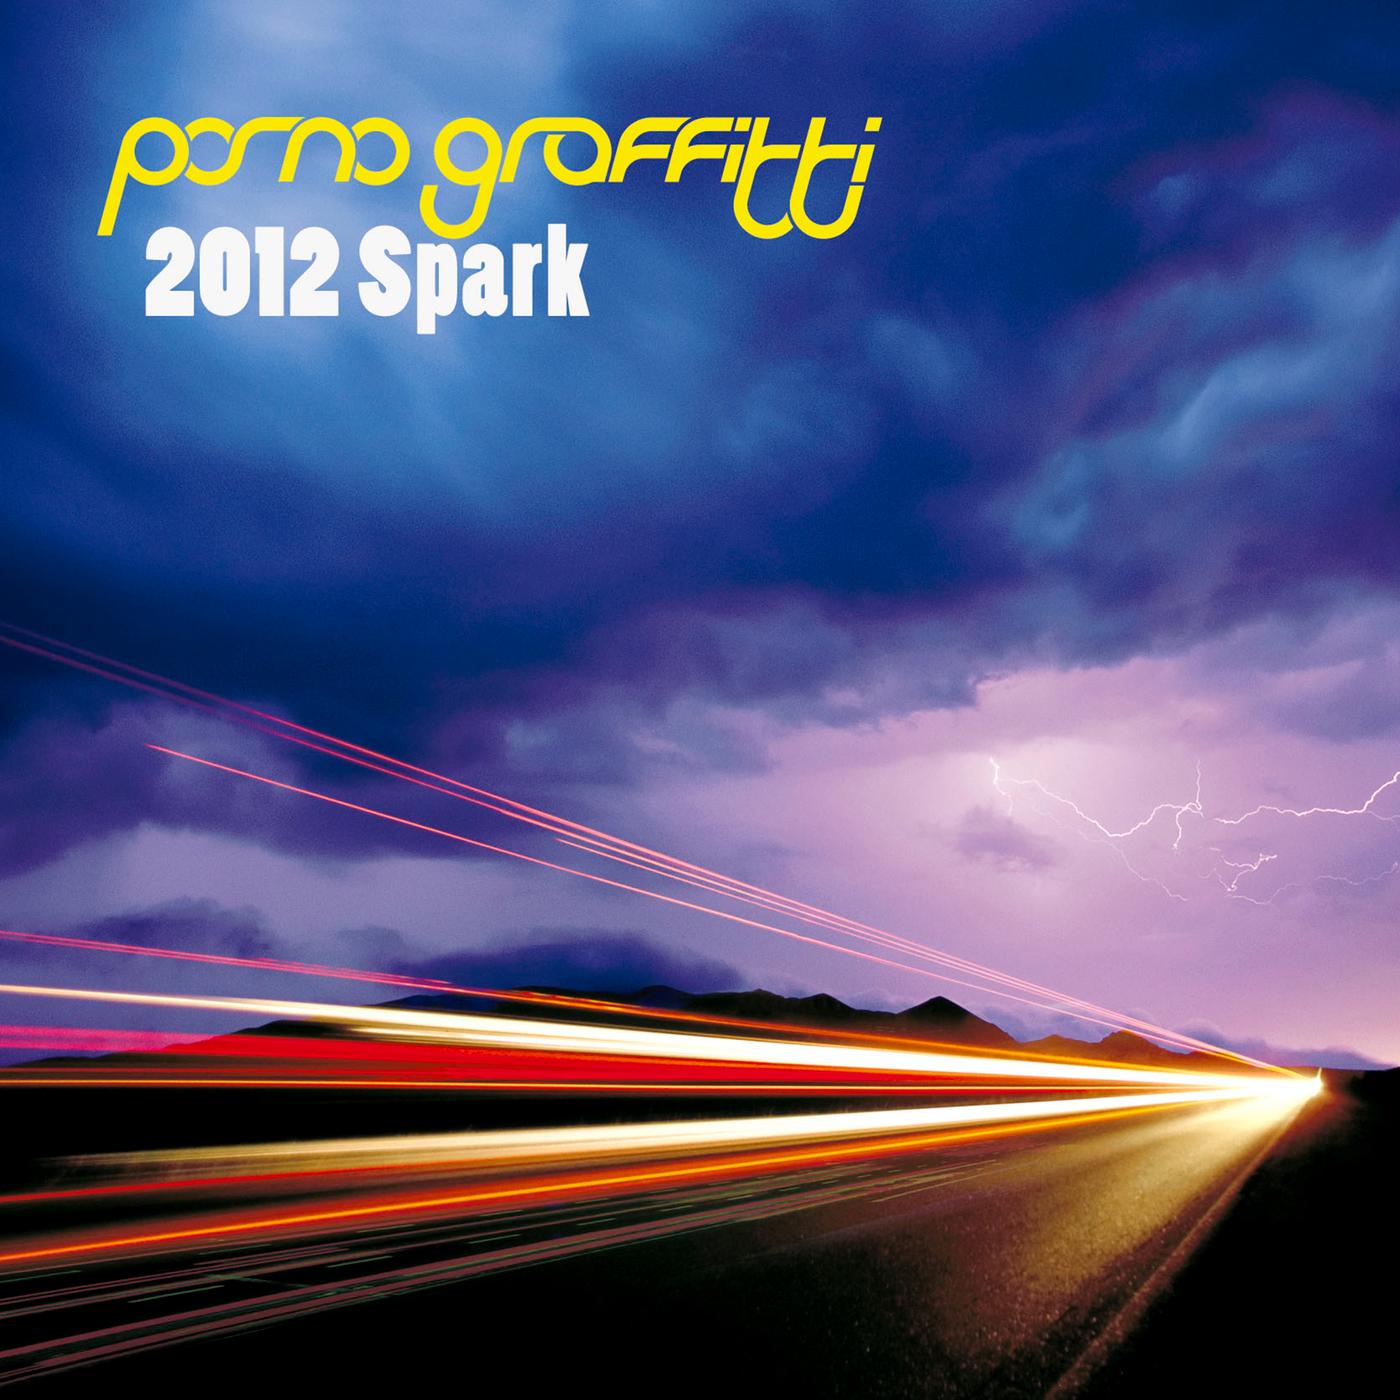 2012 Spark - Porno Graffitti